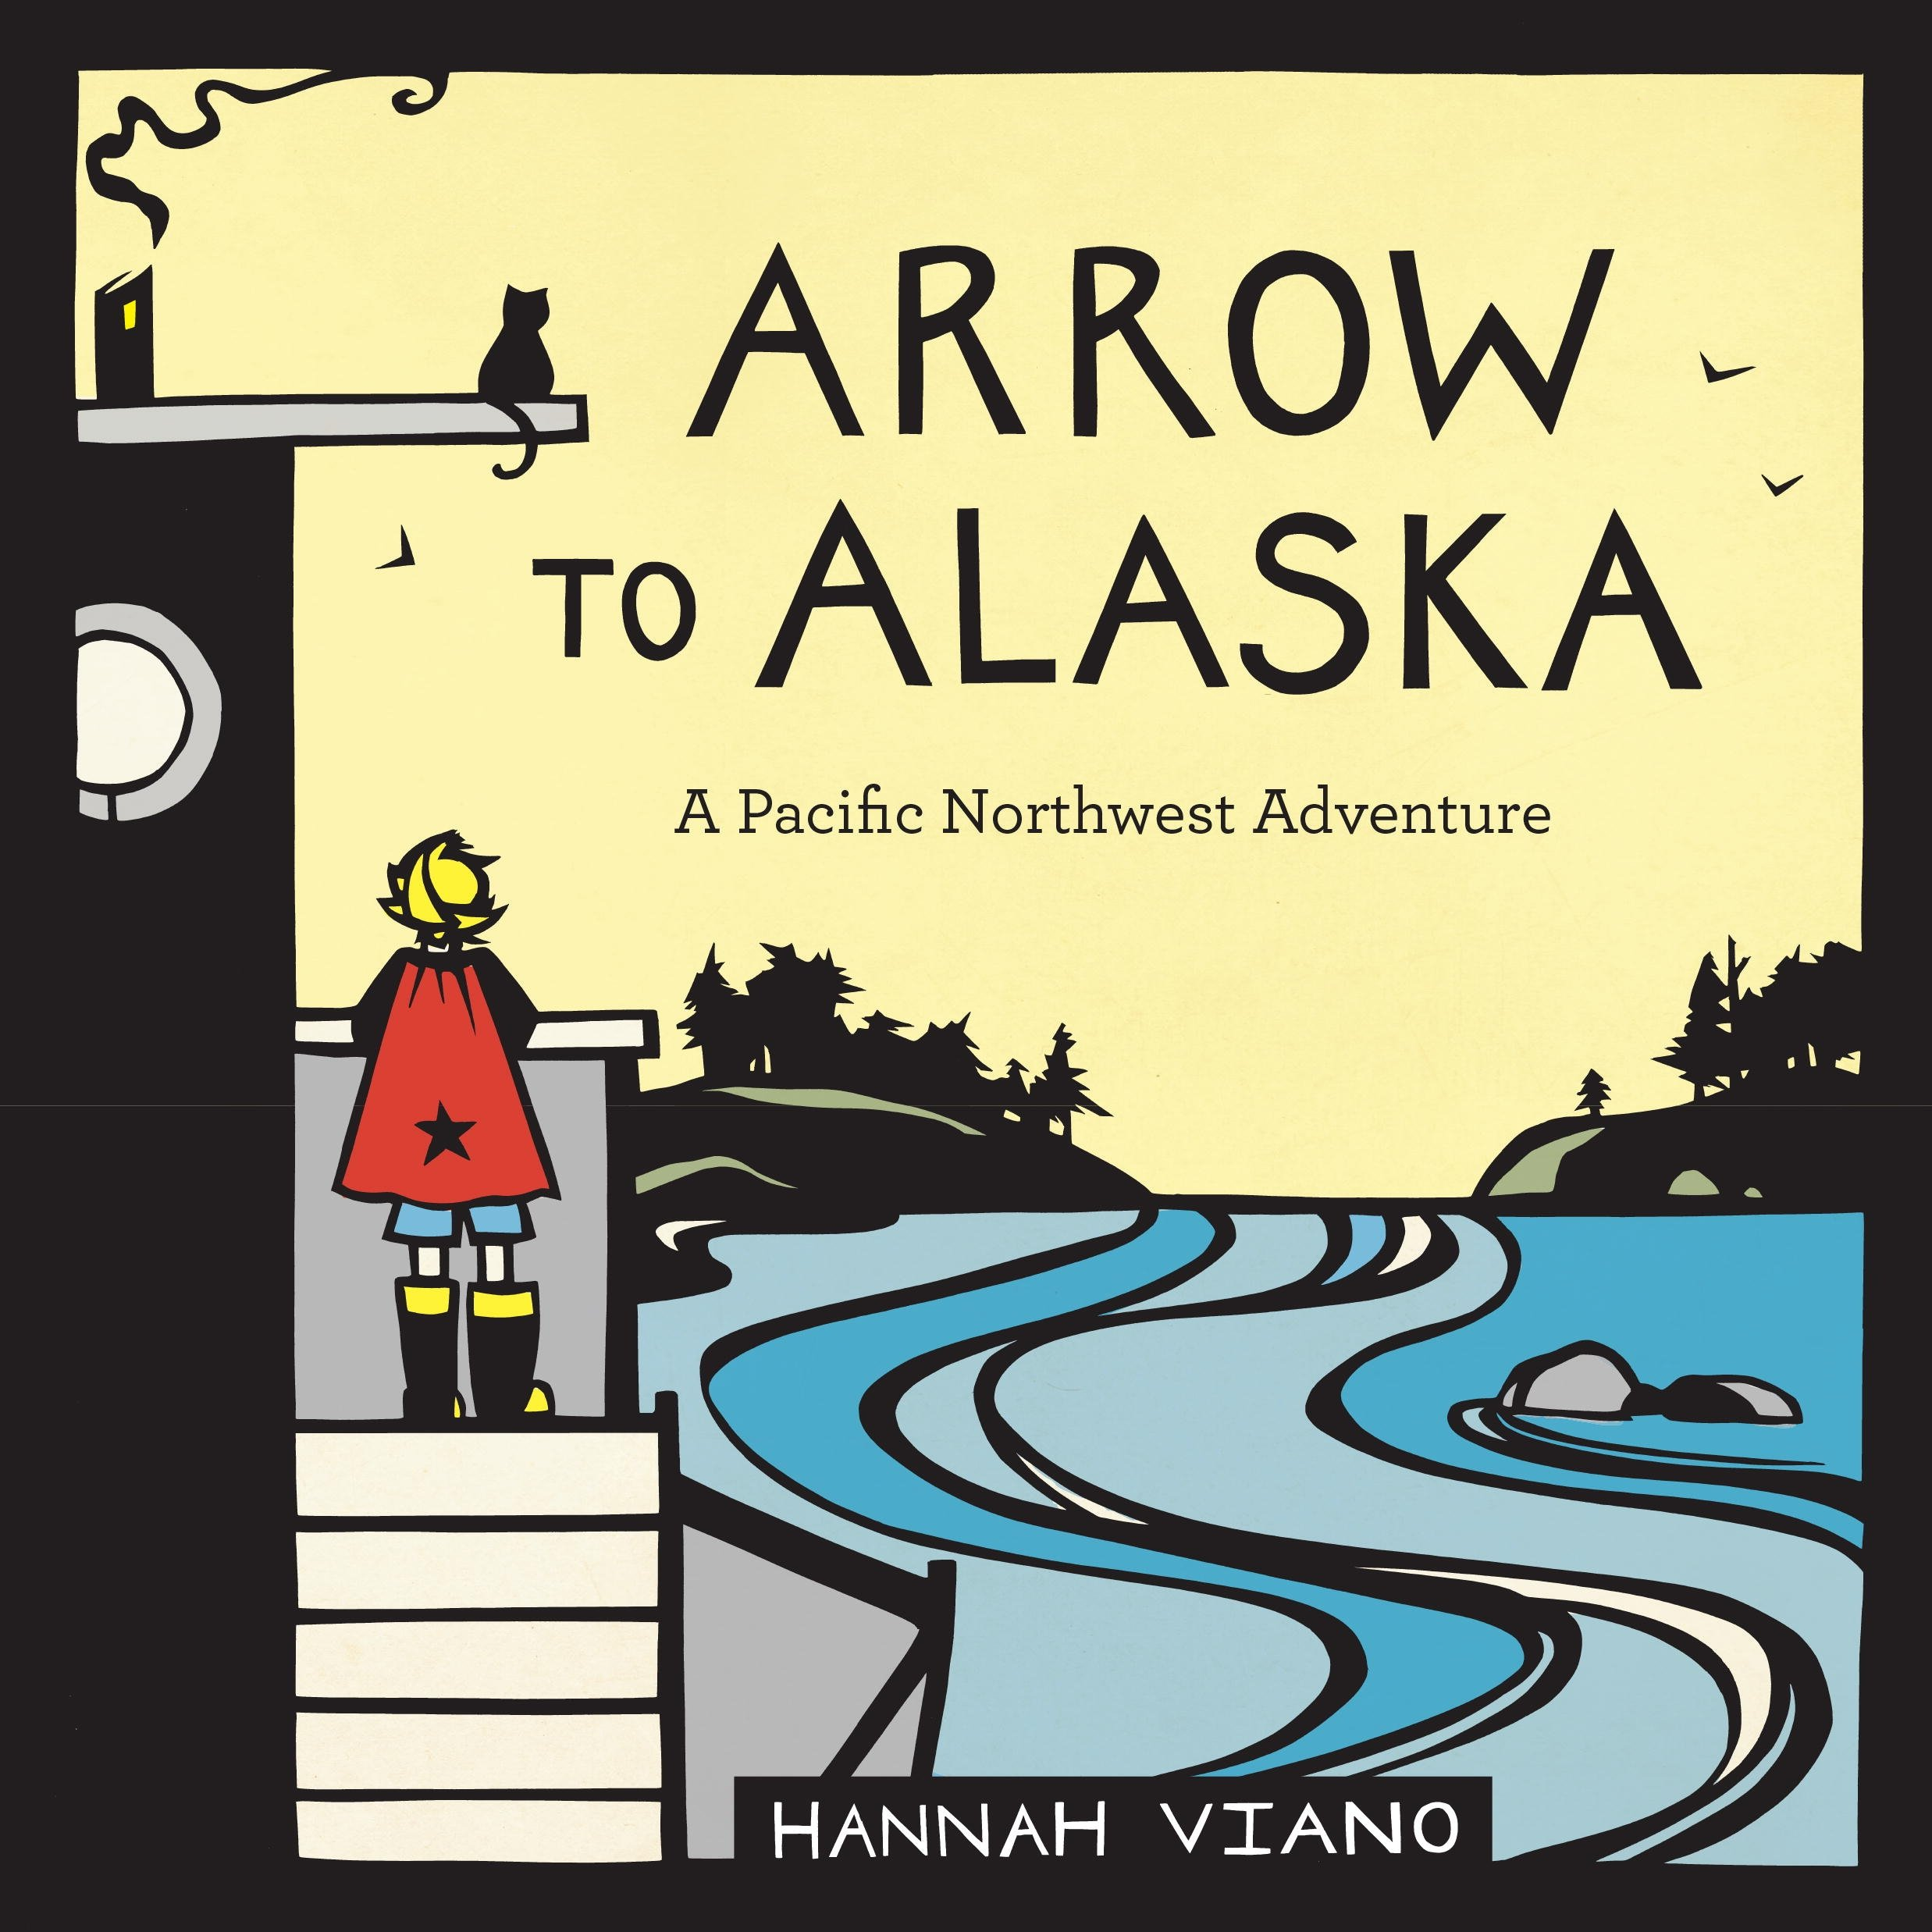 Arrow to Alaska: A Pacific Northwest Adventure